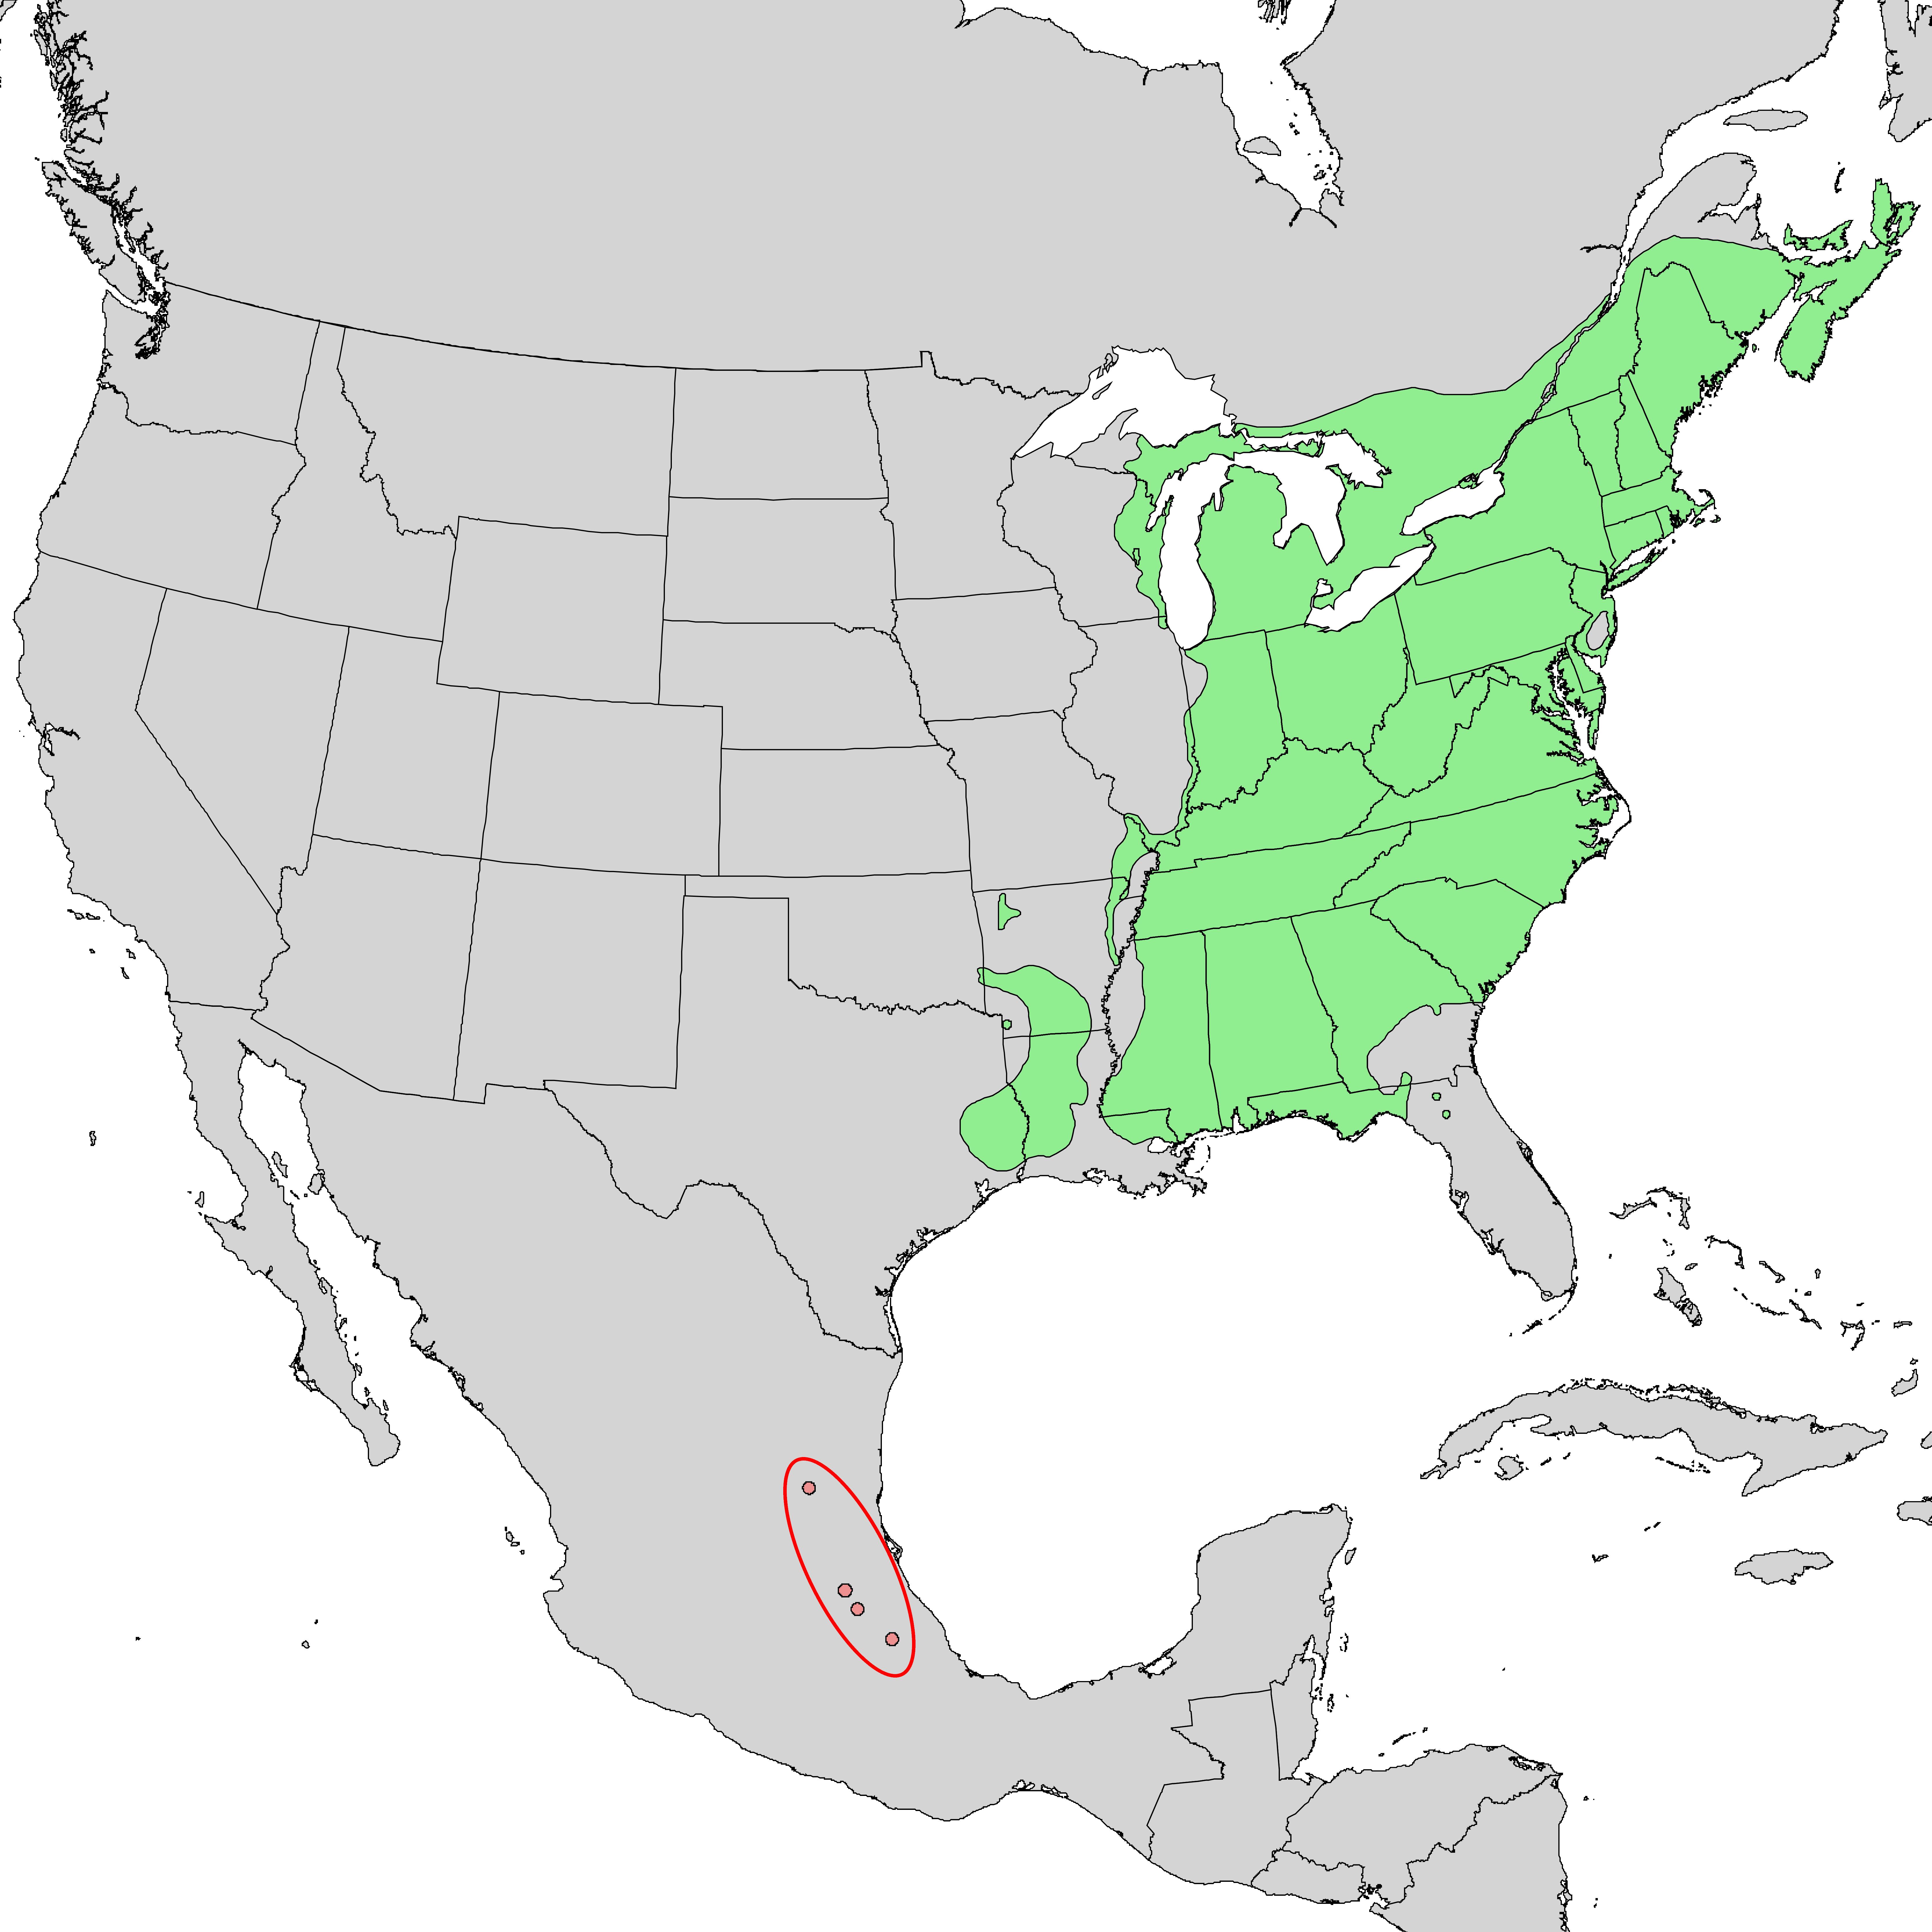 FileFagus Grandifolia Range Map Png Wikimedia Commons - Us government tree map